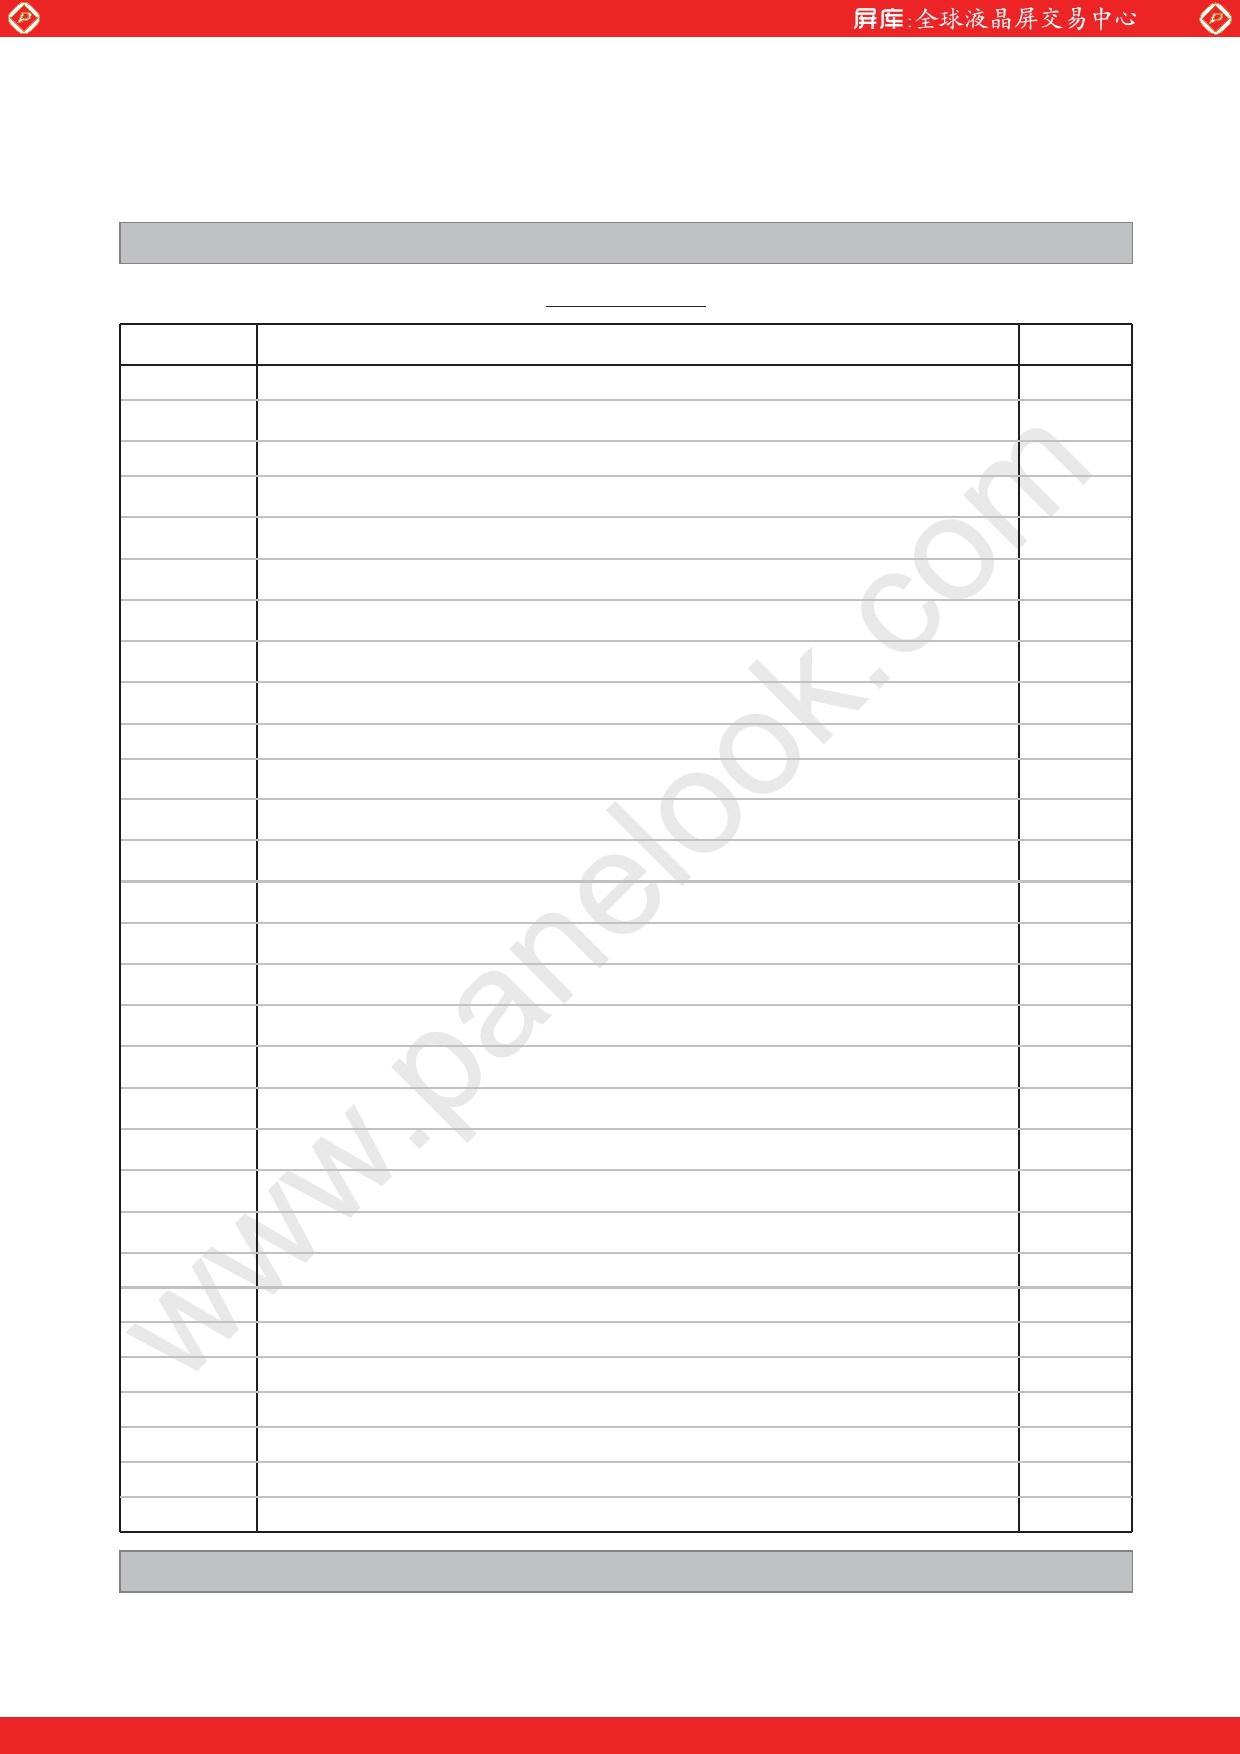 LC320EUD-SEF1 datasheet